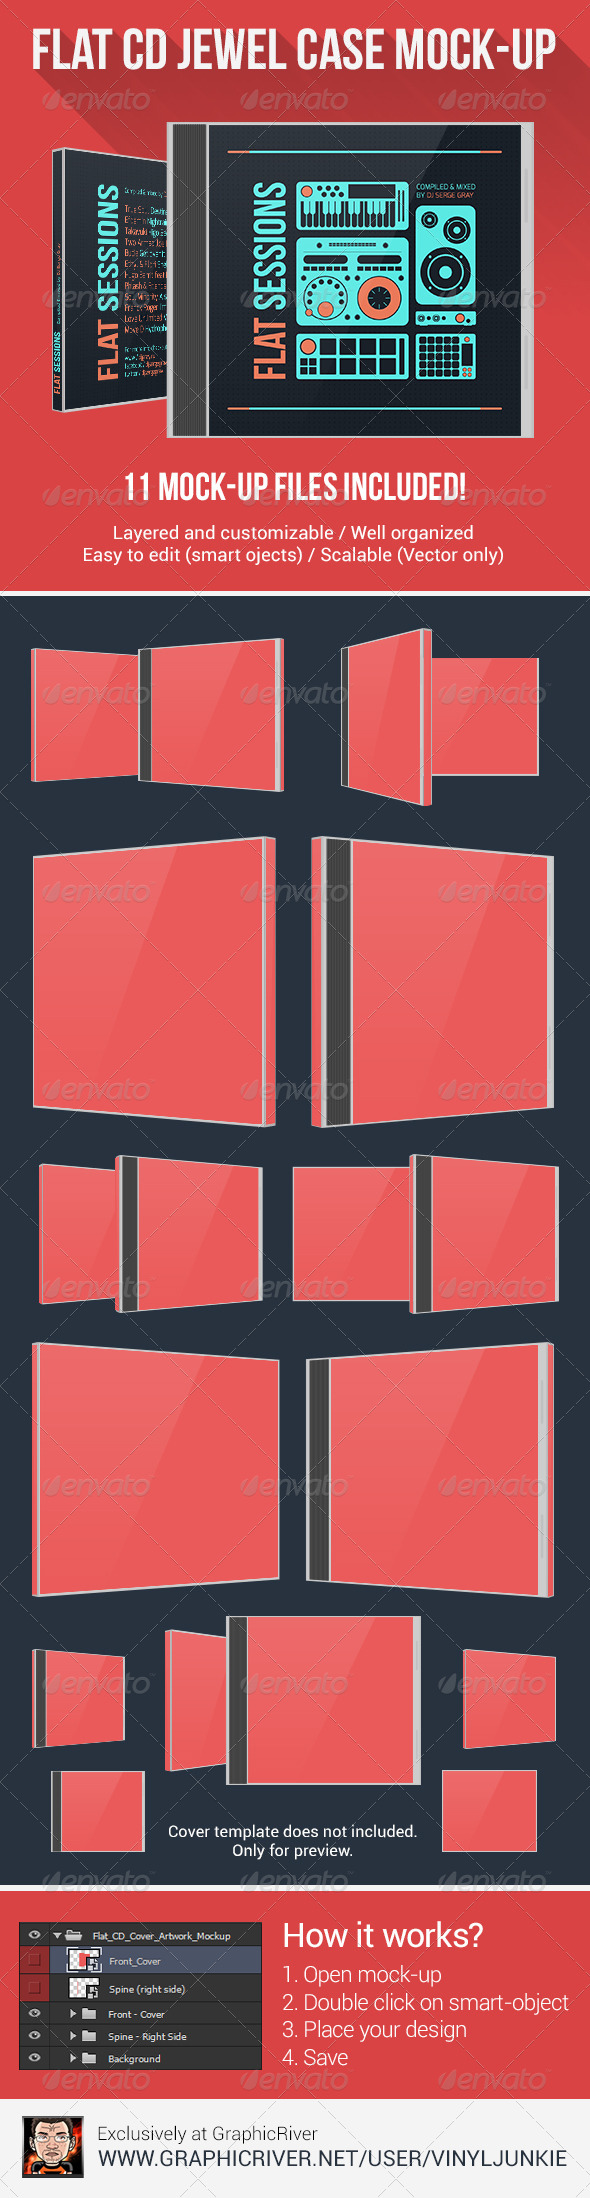 GraphicRiver Flat CD Jewel Case Mock-Up 6135640